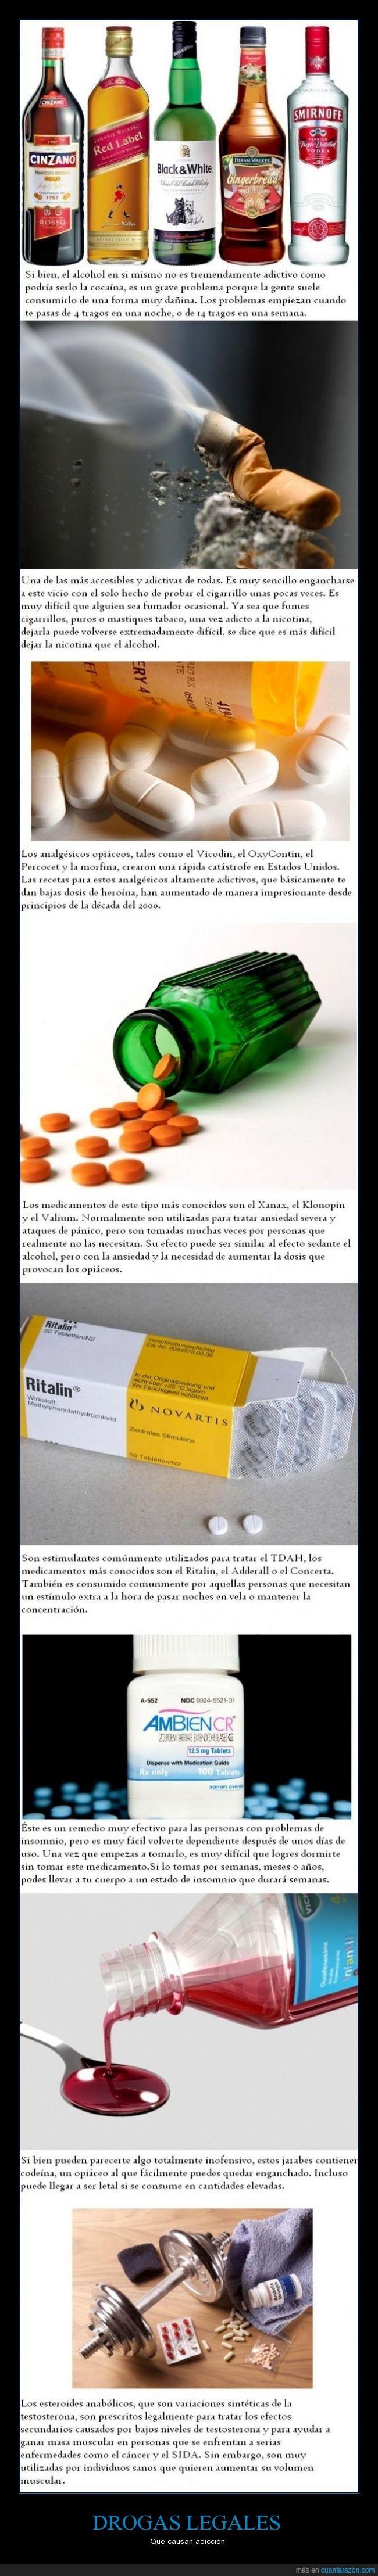 alcohol,codeina,droga,esteroides,fumar,jarabe,legal,opiaceo,tabaco,xanax